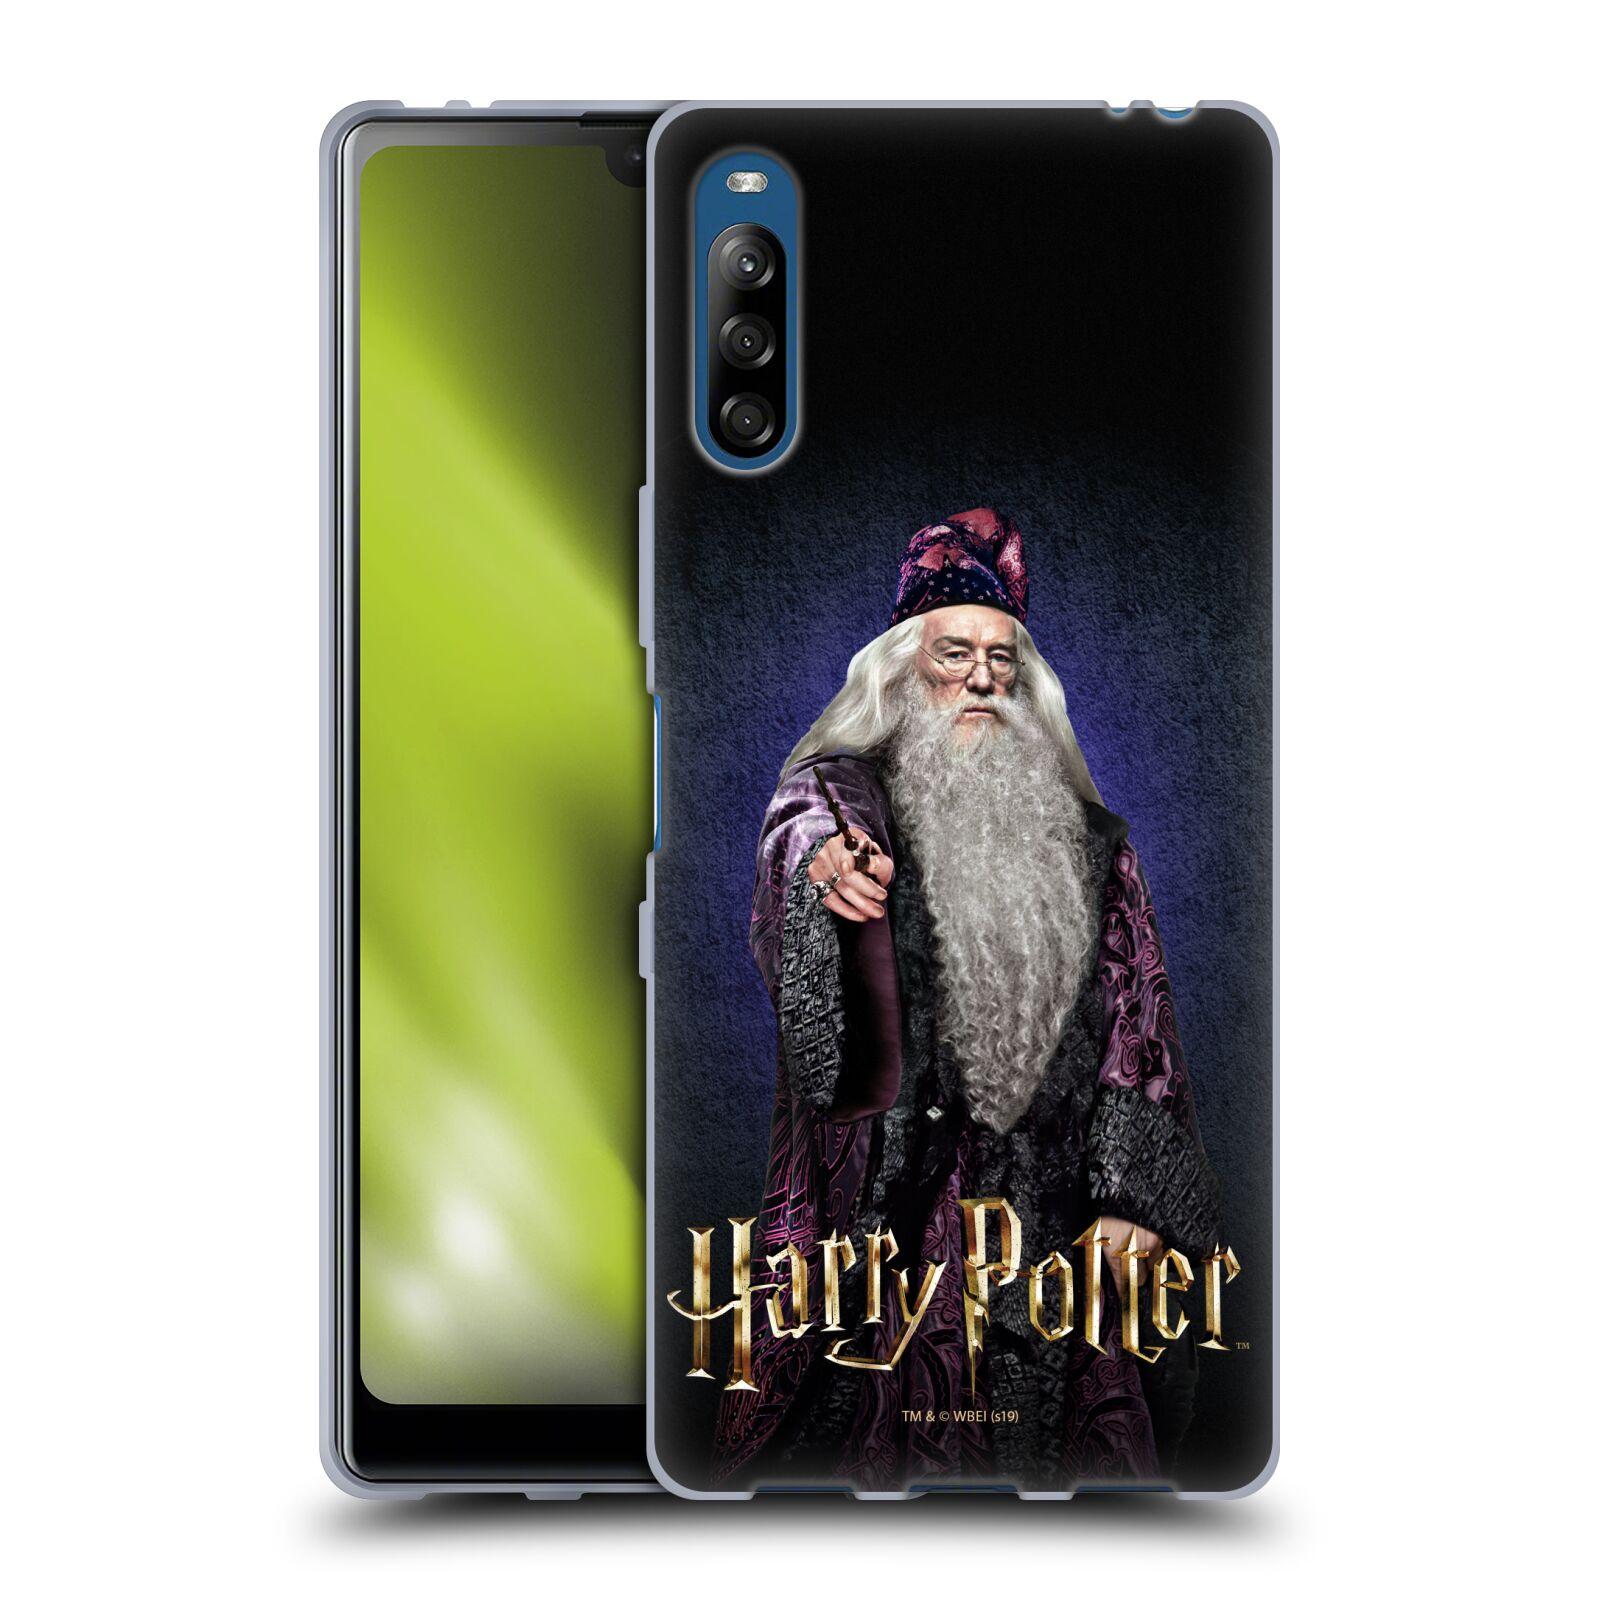 Silikonové pouzdro na mobil Sony Xperia L4 - Harry Potter - Albus Brumbál